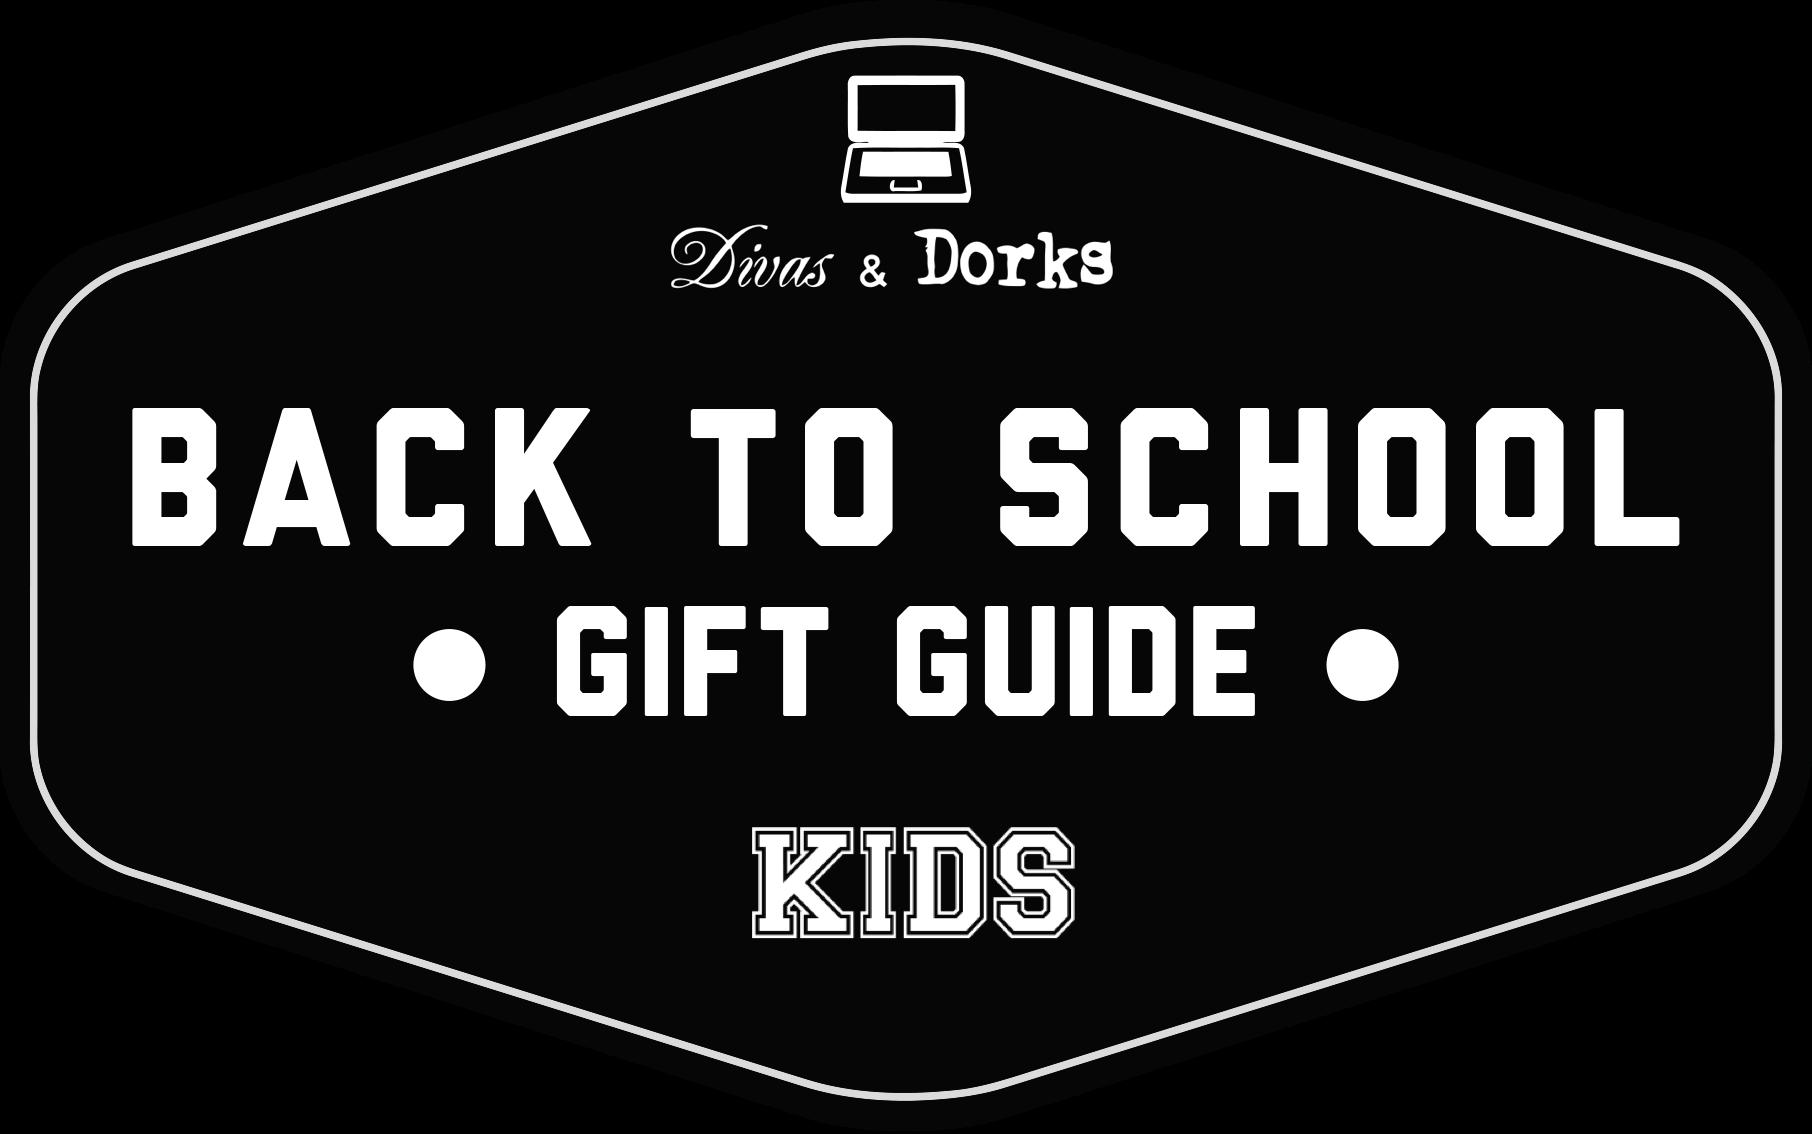 Back To School Guide 2015 Kids